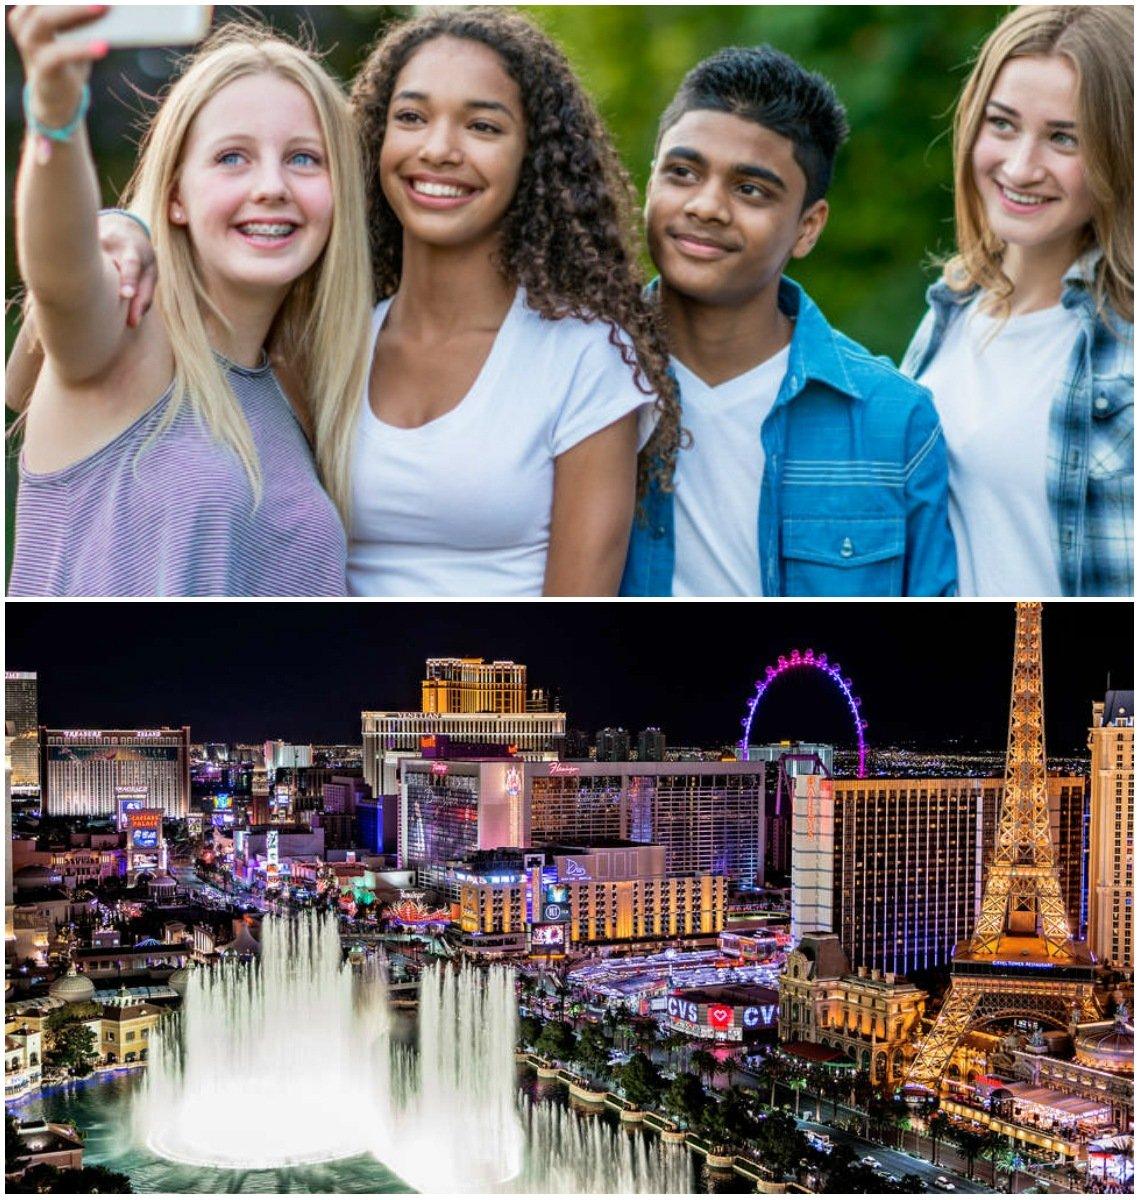 Generation Z Las Vegas casino